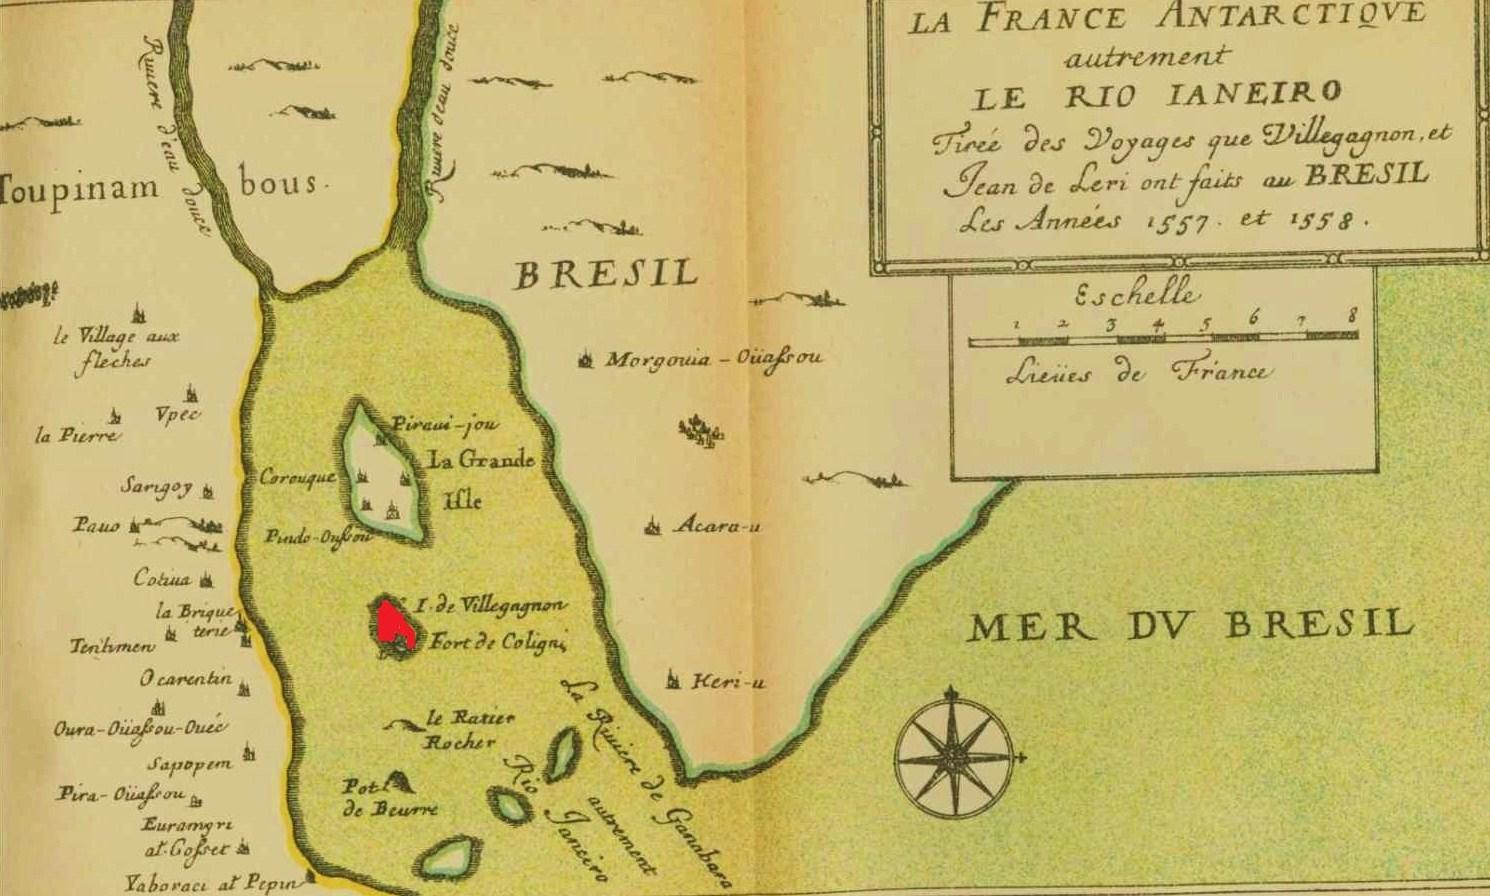 Mapa França Antártica